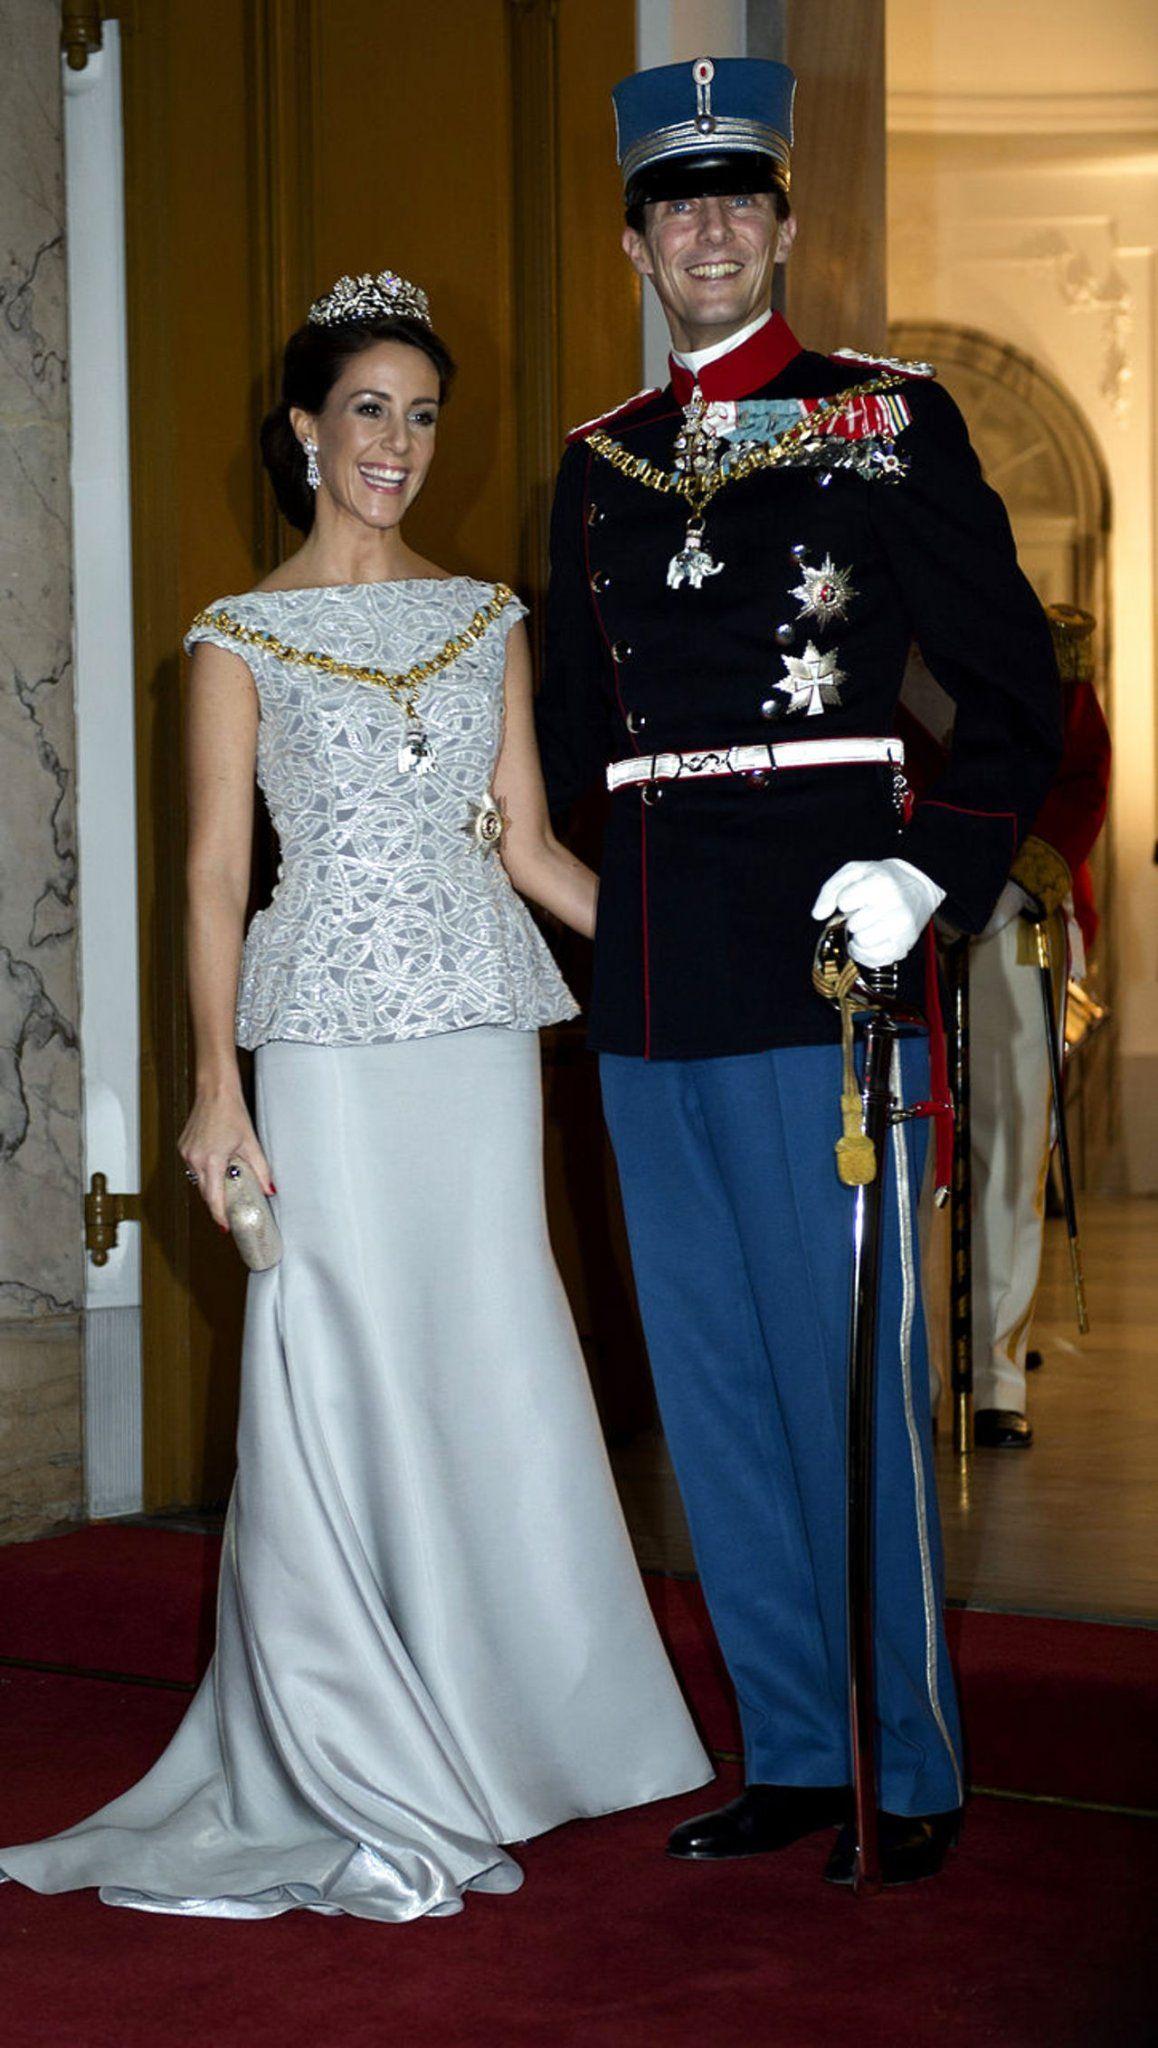 Pin de Silvi Coto en monarchies of the world | Pinterest